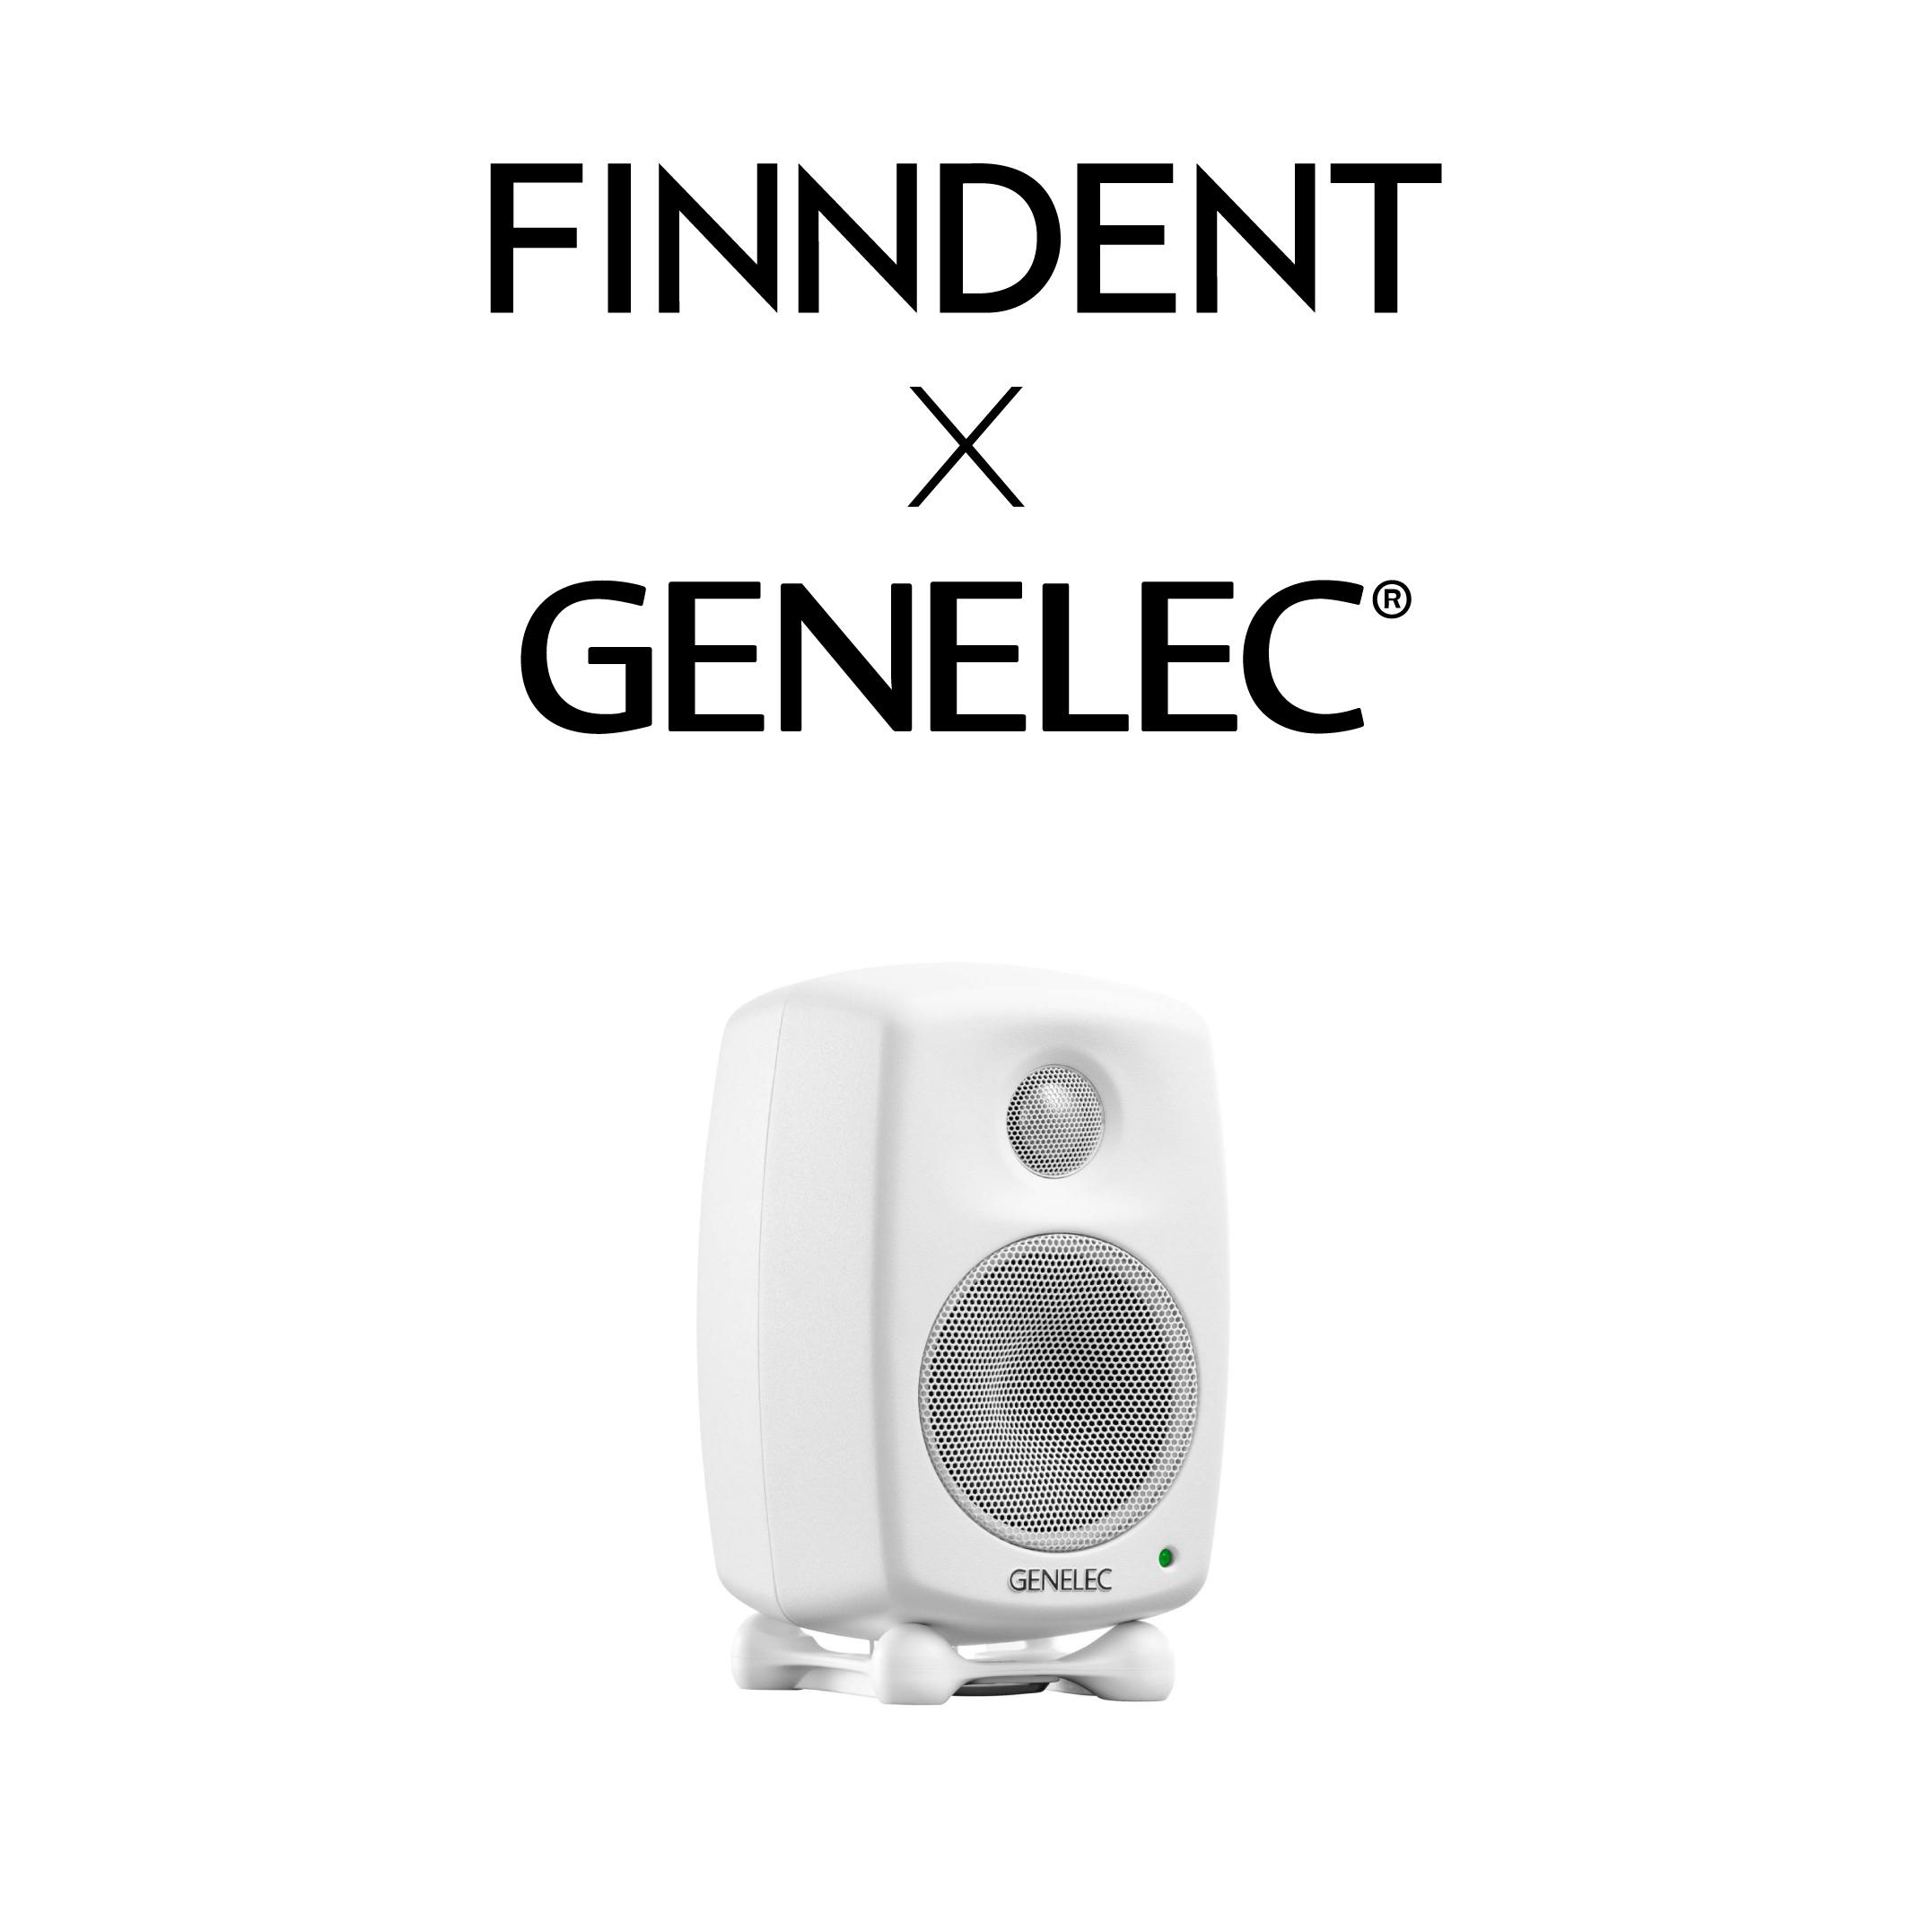 Finndent X Genelec